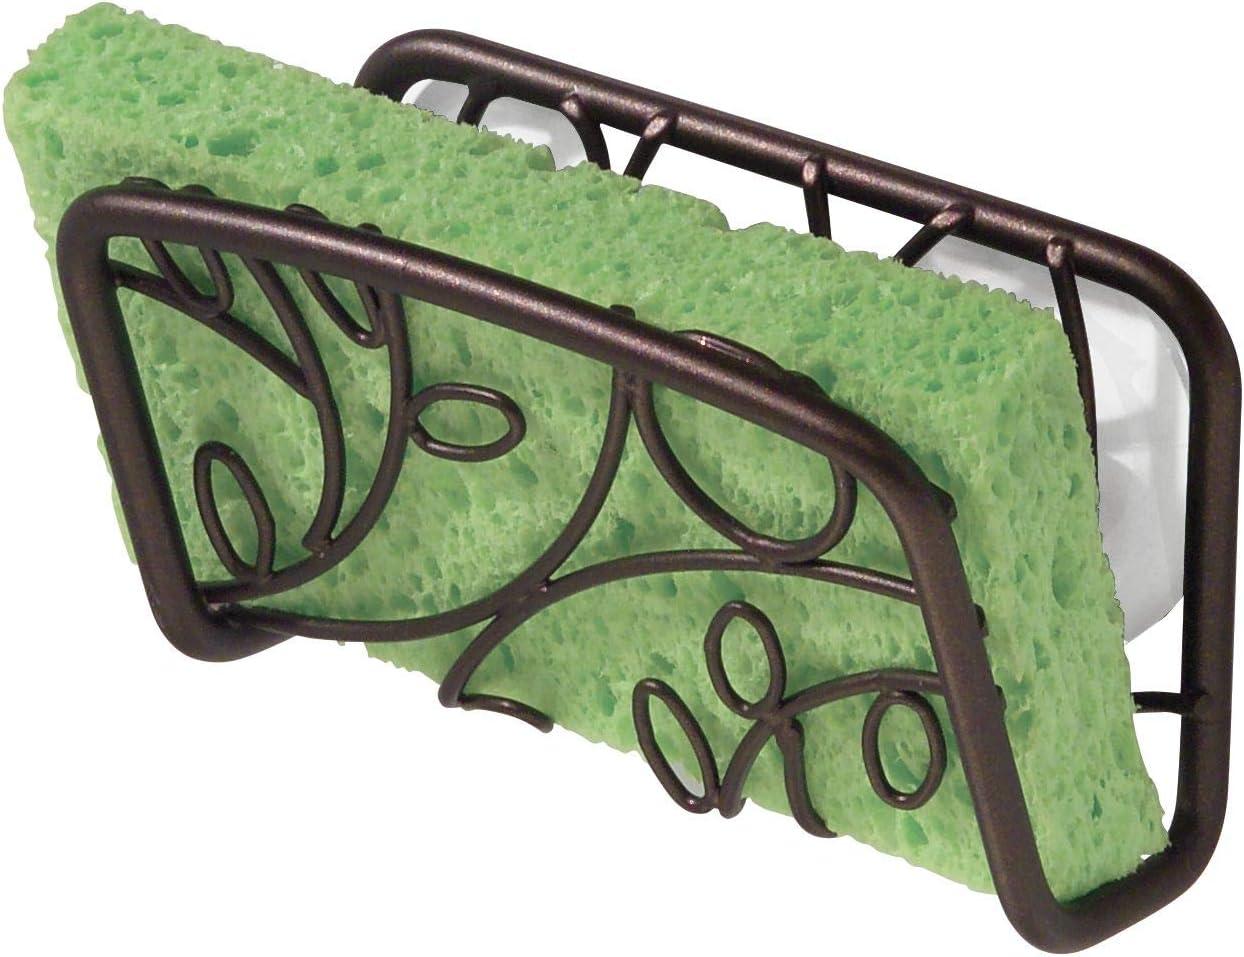 InterDesign Twigz Kitchen Sink Suction Holder for Sponges Bronze Scrubbers Soap